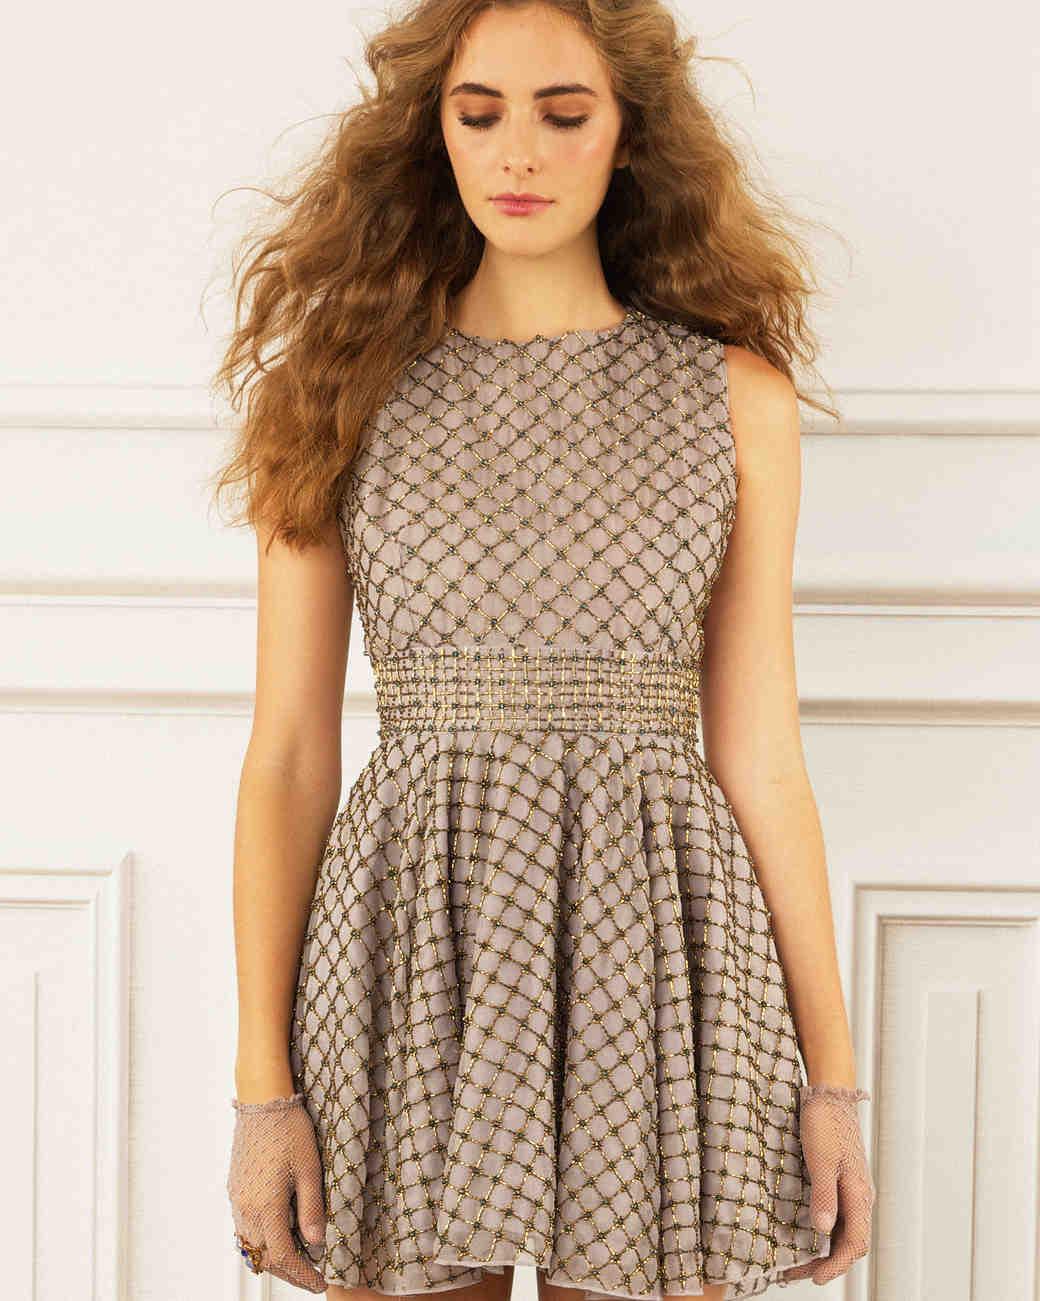 maria korovilas wedding dress spring 2017 short sleeveless pattern